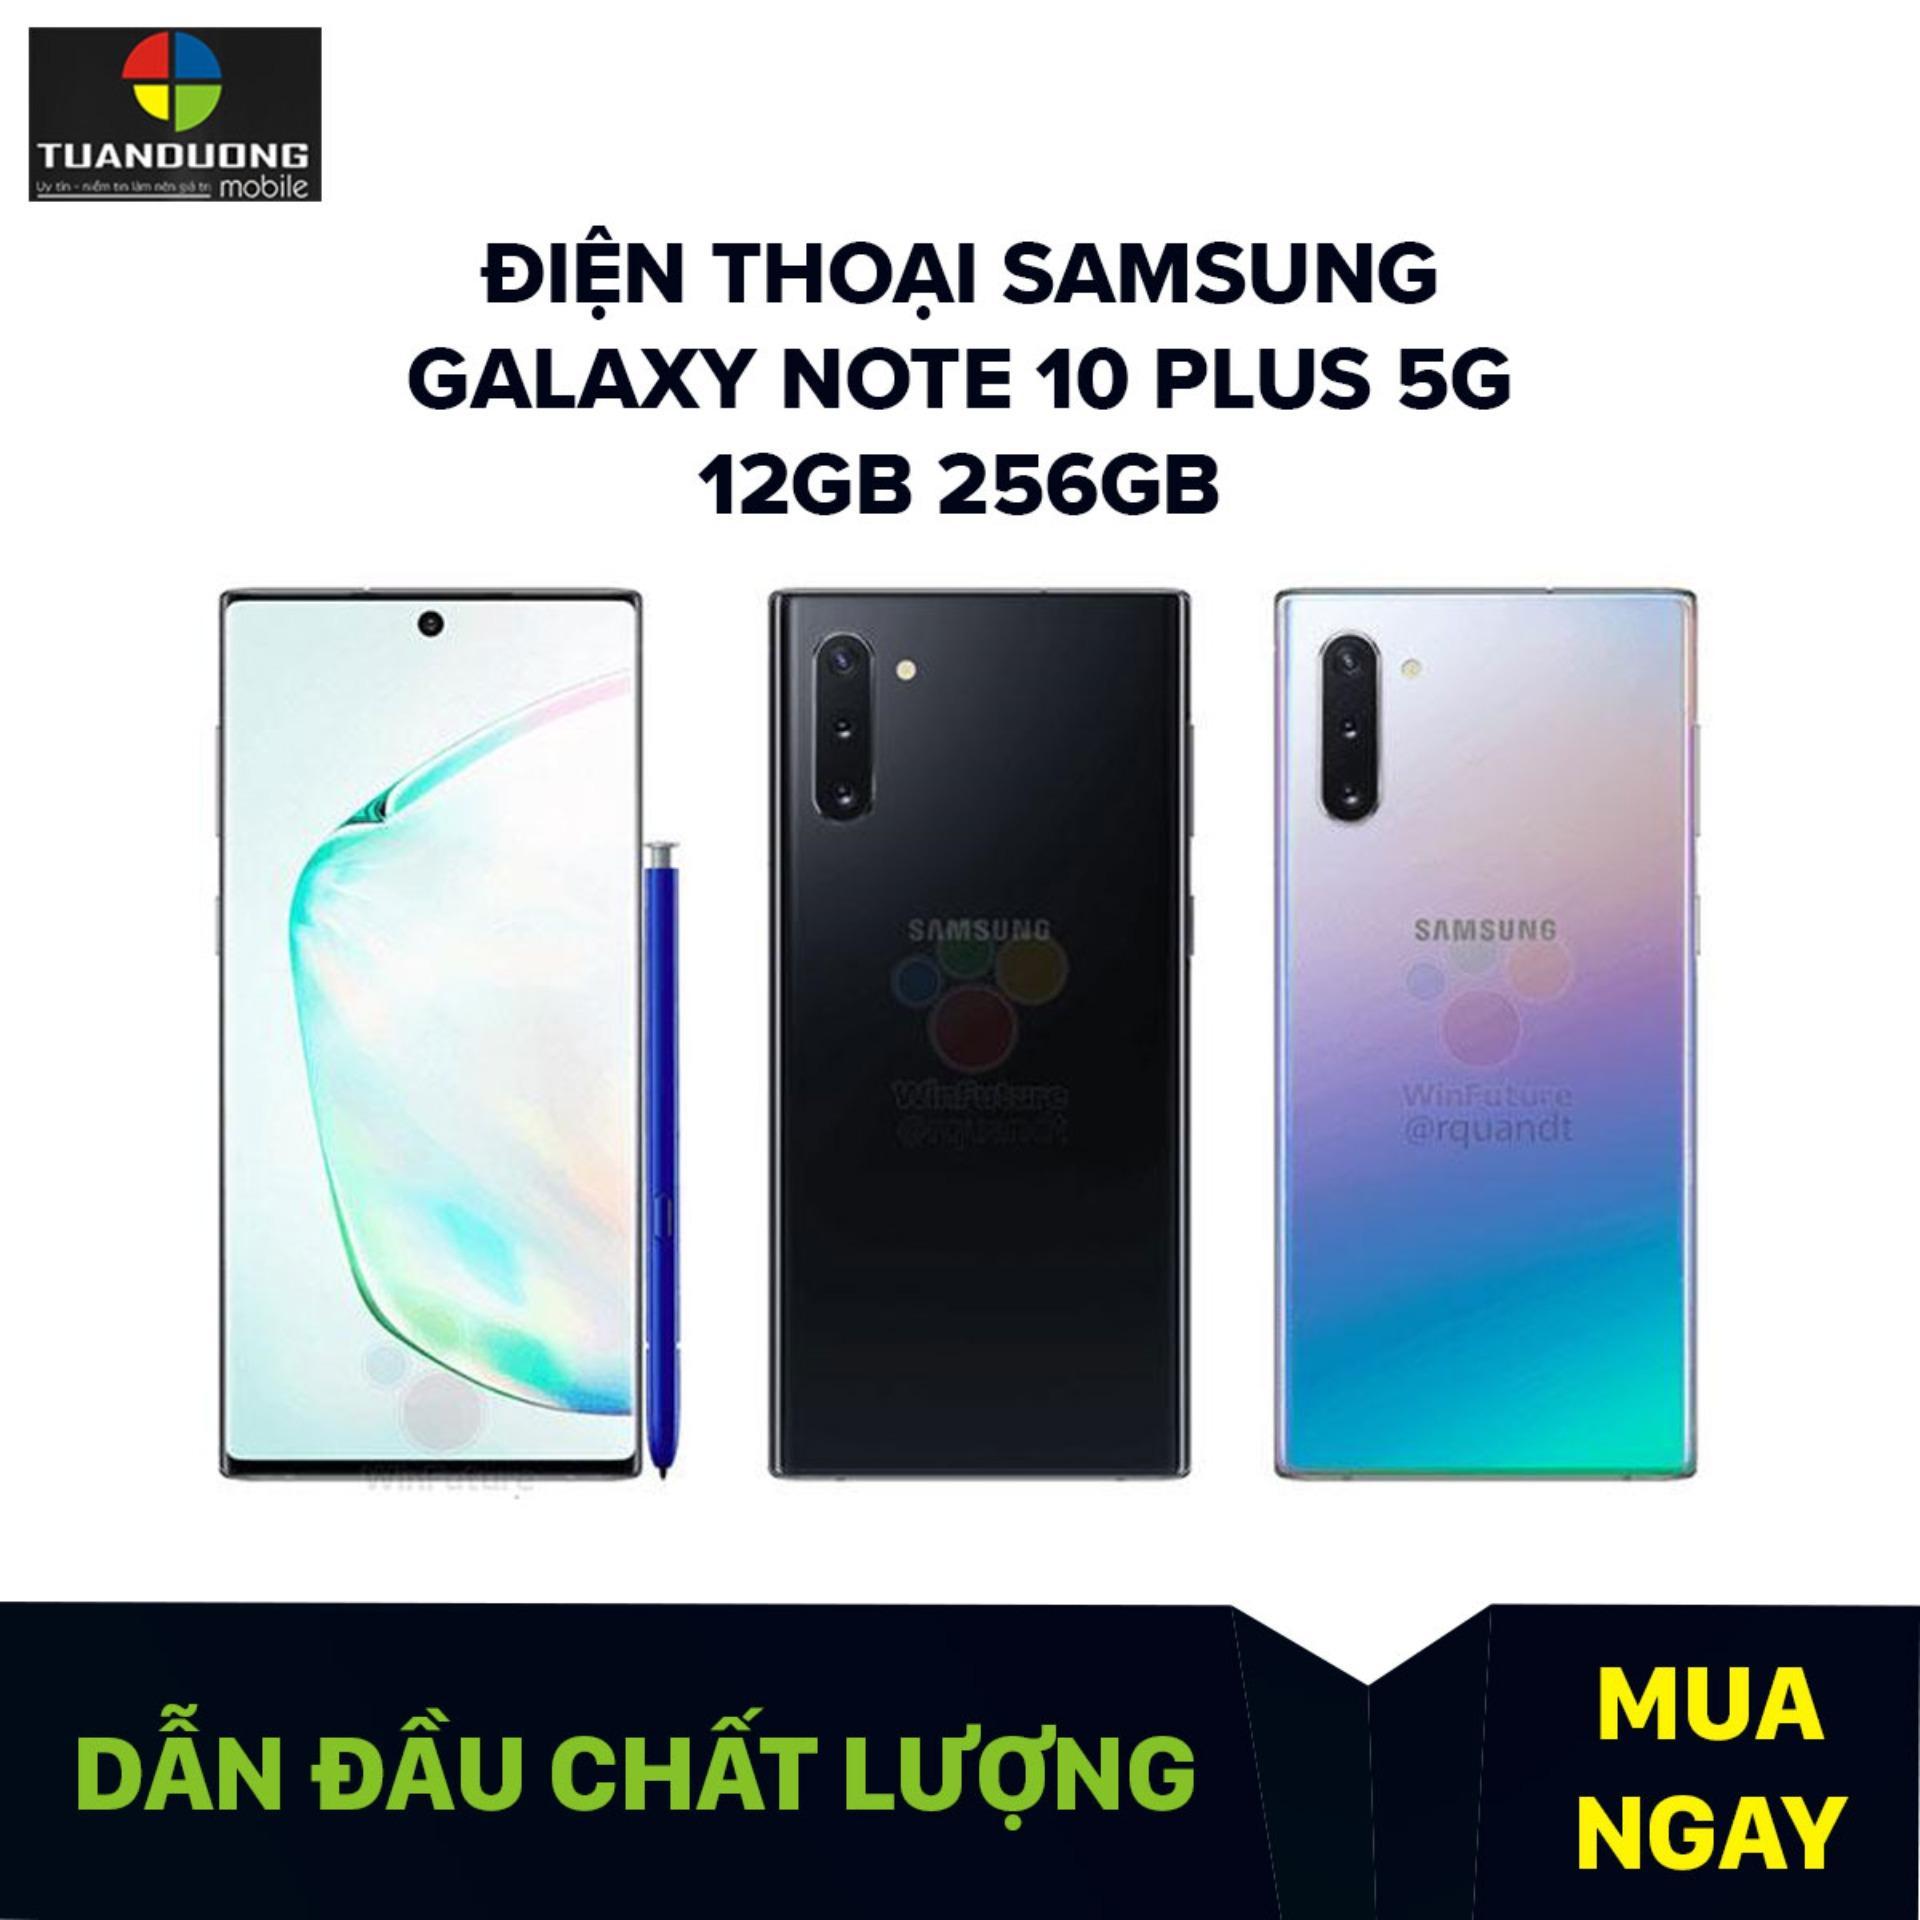 Điện thoại Samsung Galaxy Note 10 Plus 5G 12GB 256GB